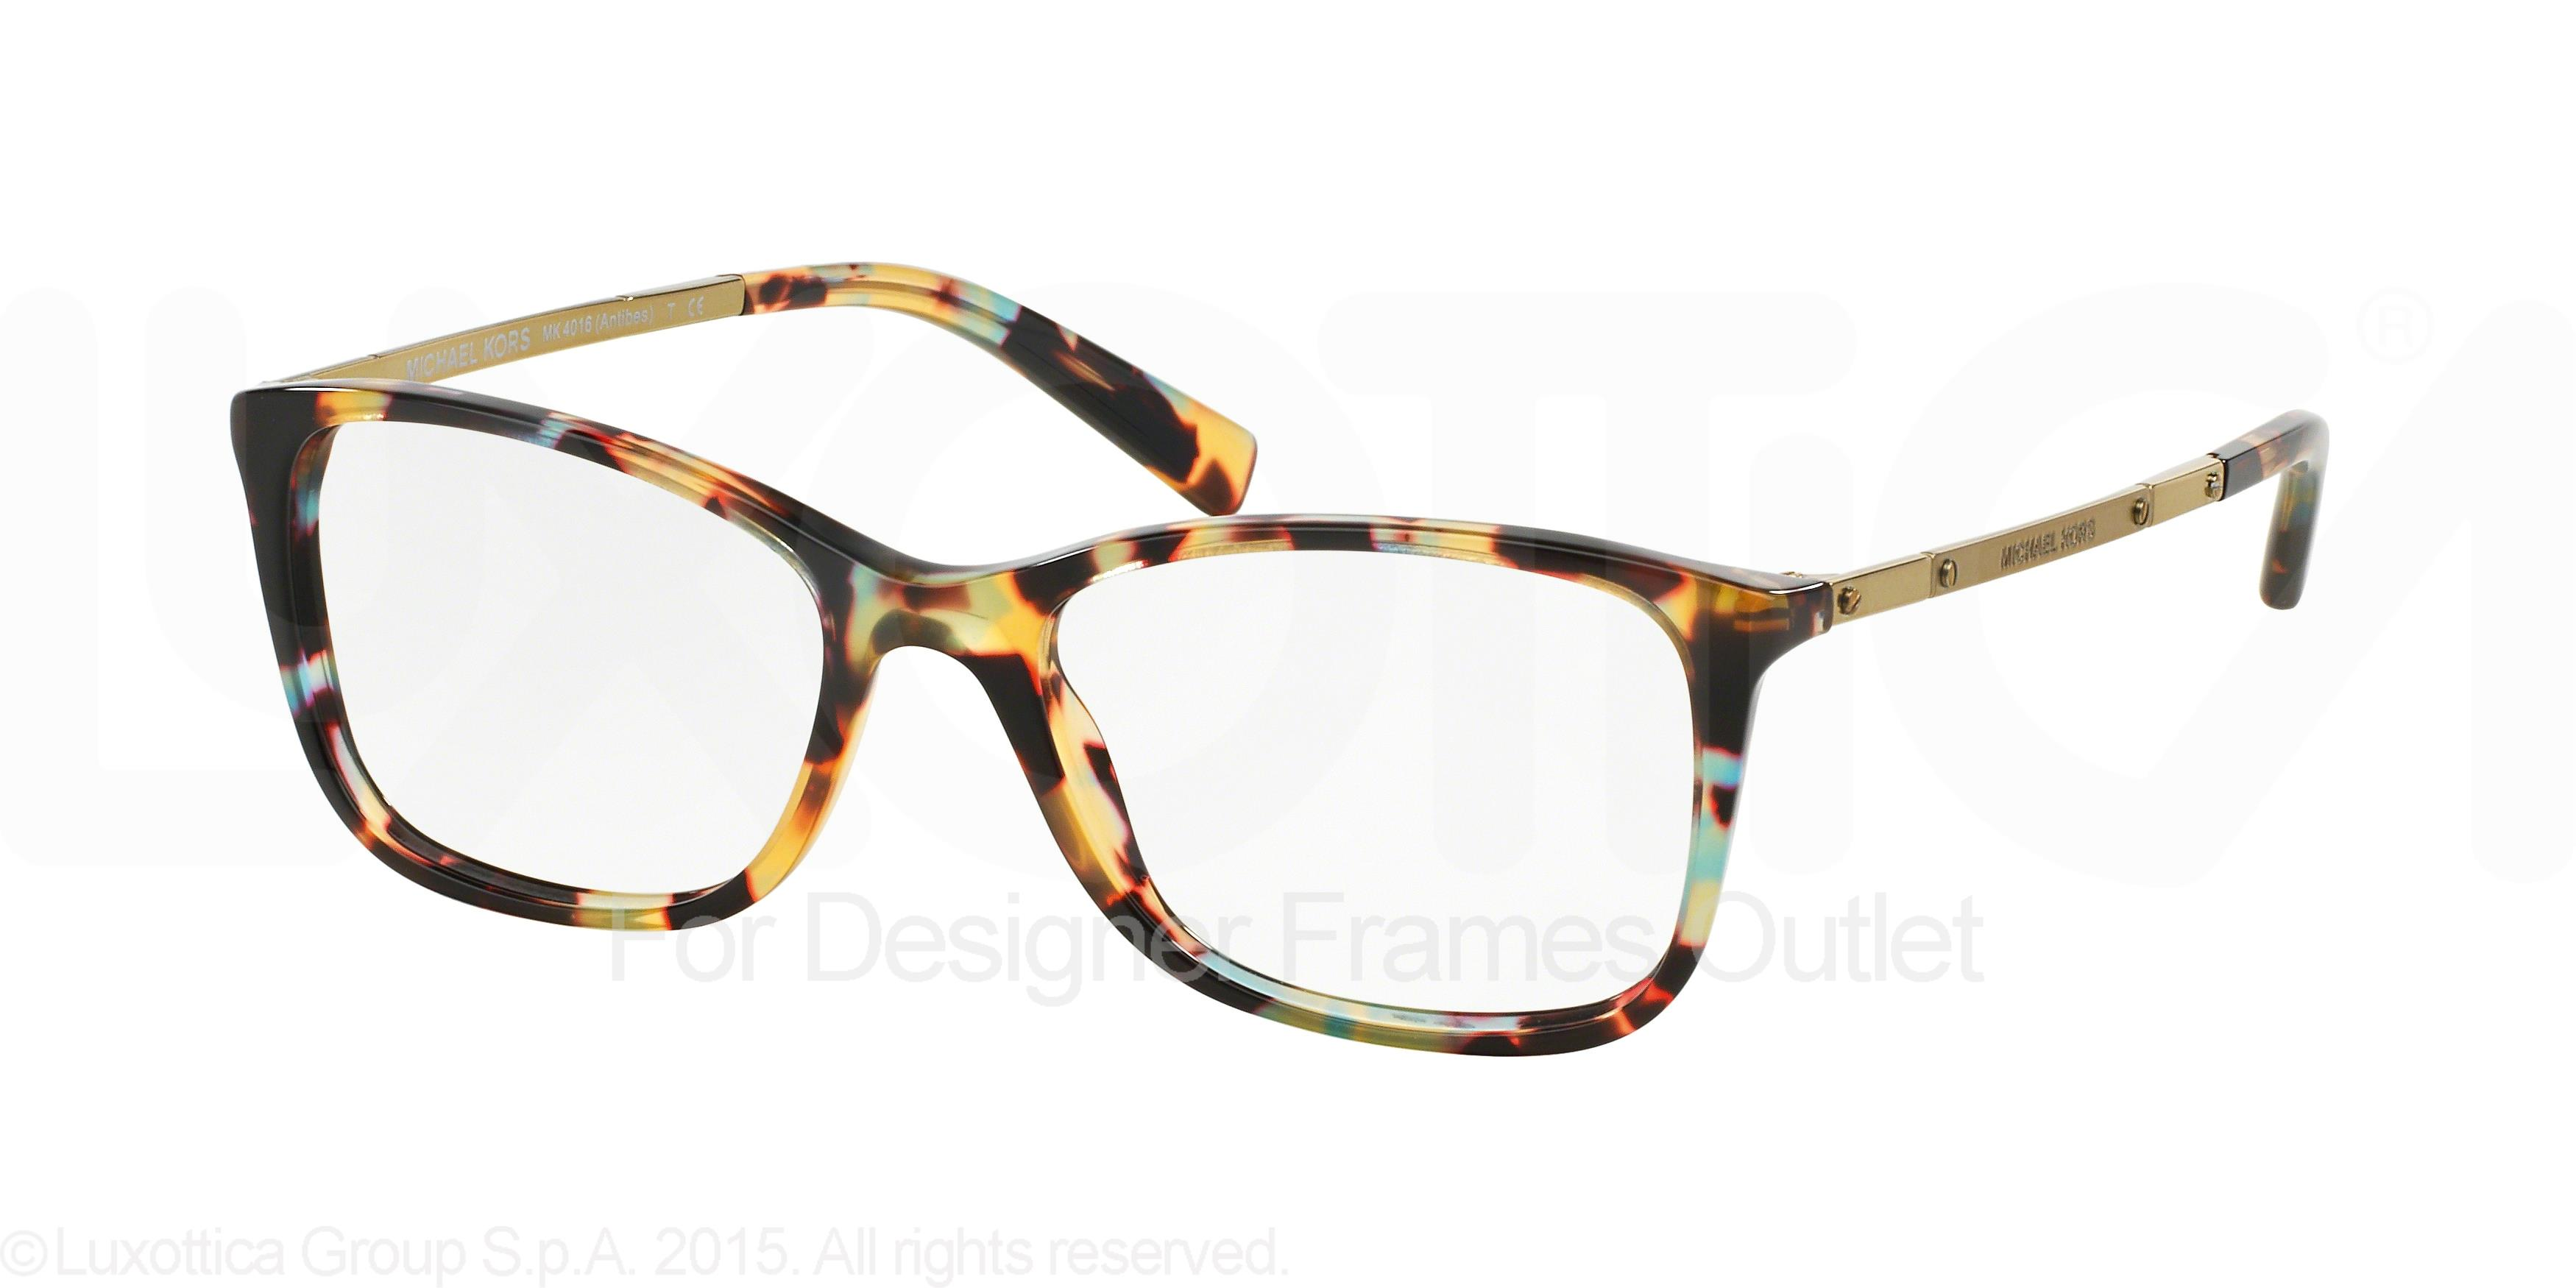 a5b18e7f725b Designer Outlet Eyeglasses